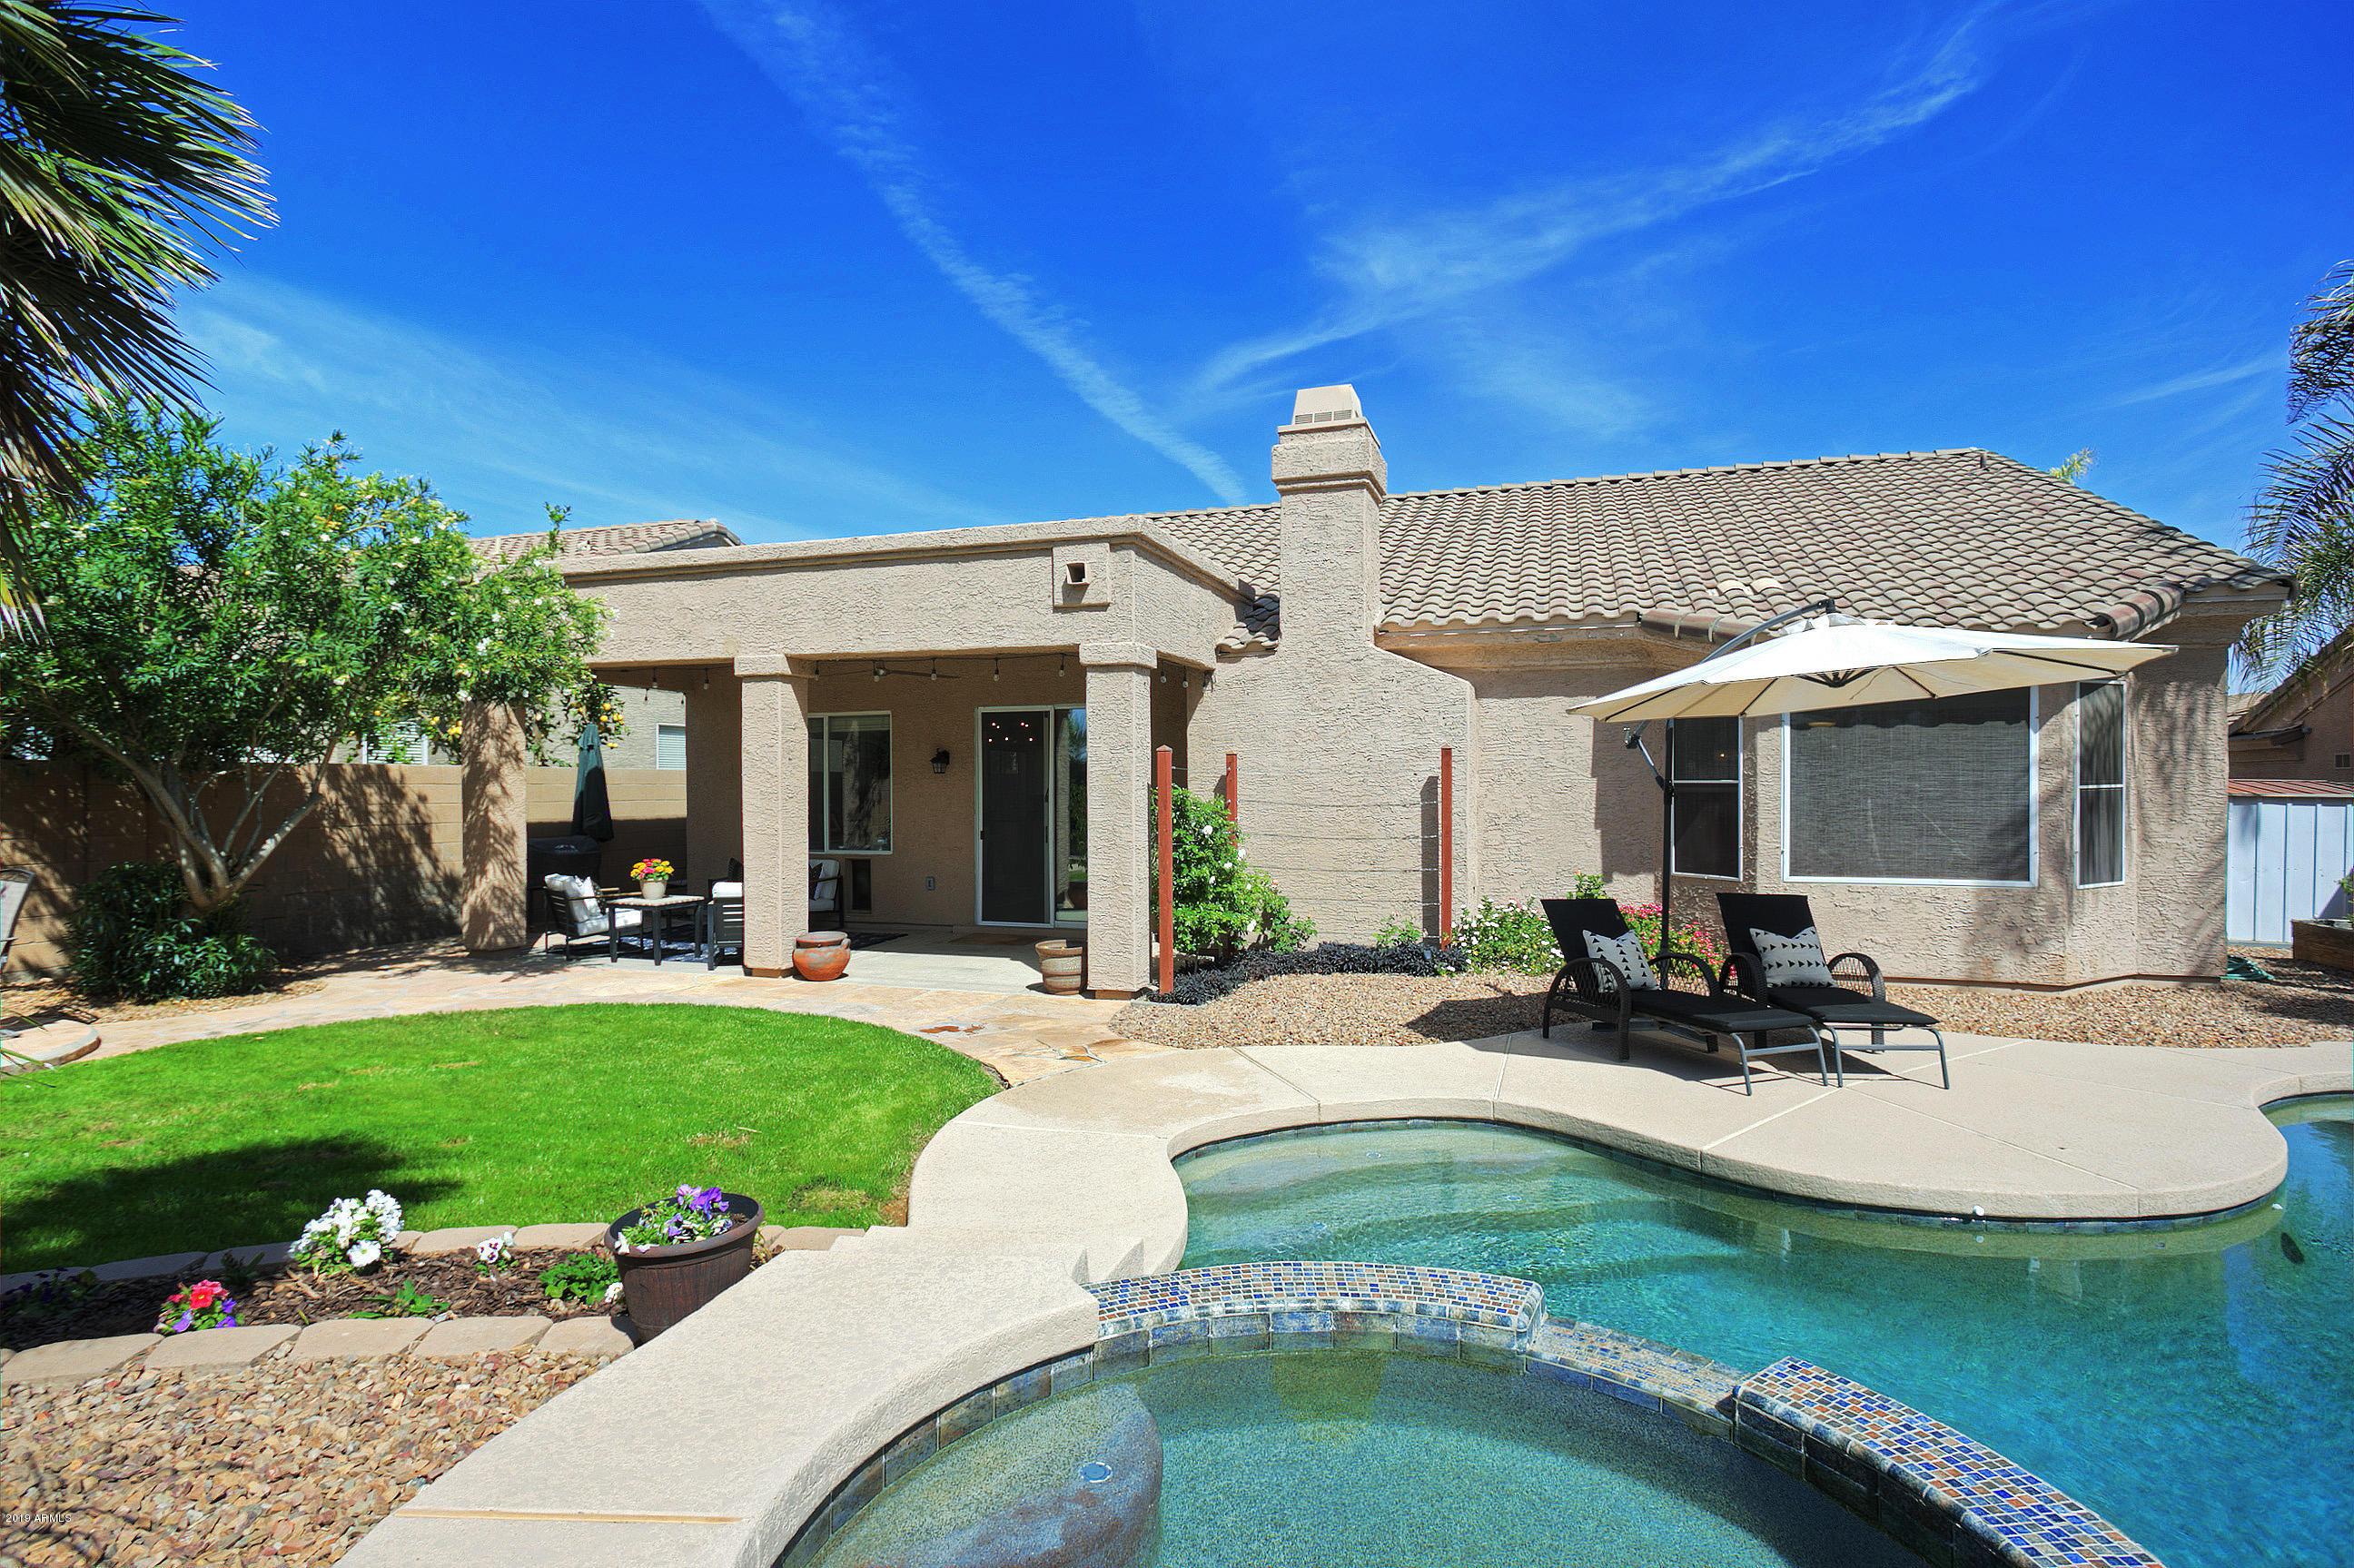 MLS 5909582 895 W Aloe Place, Chandler, AZ 85248 Chandler AZ Ocotillo